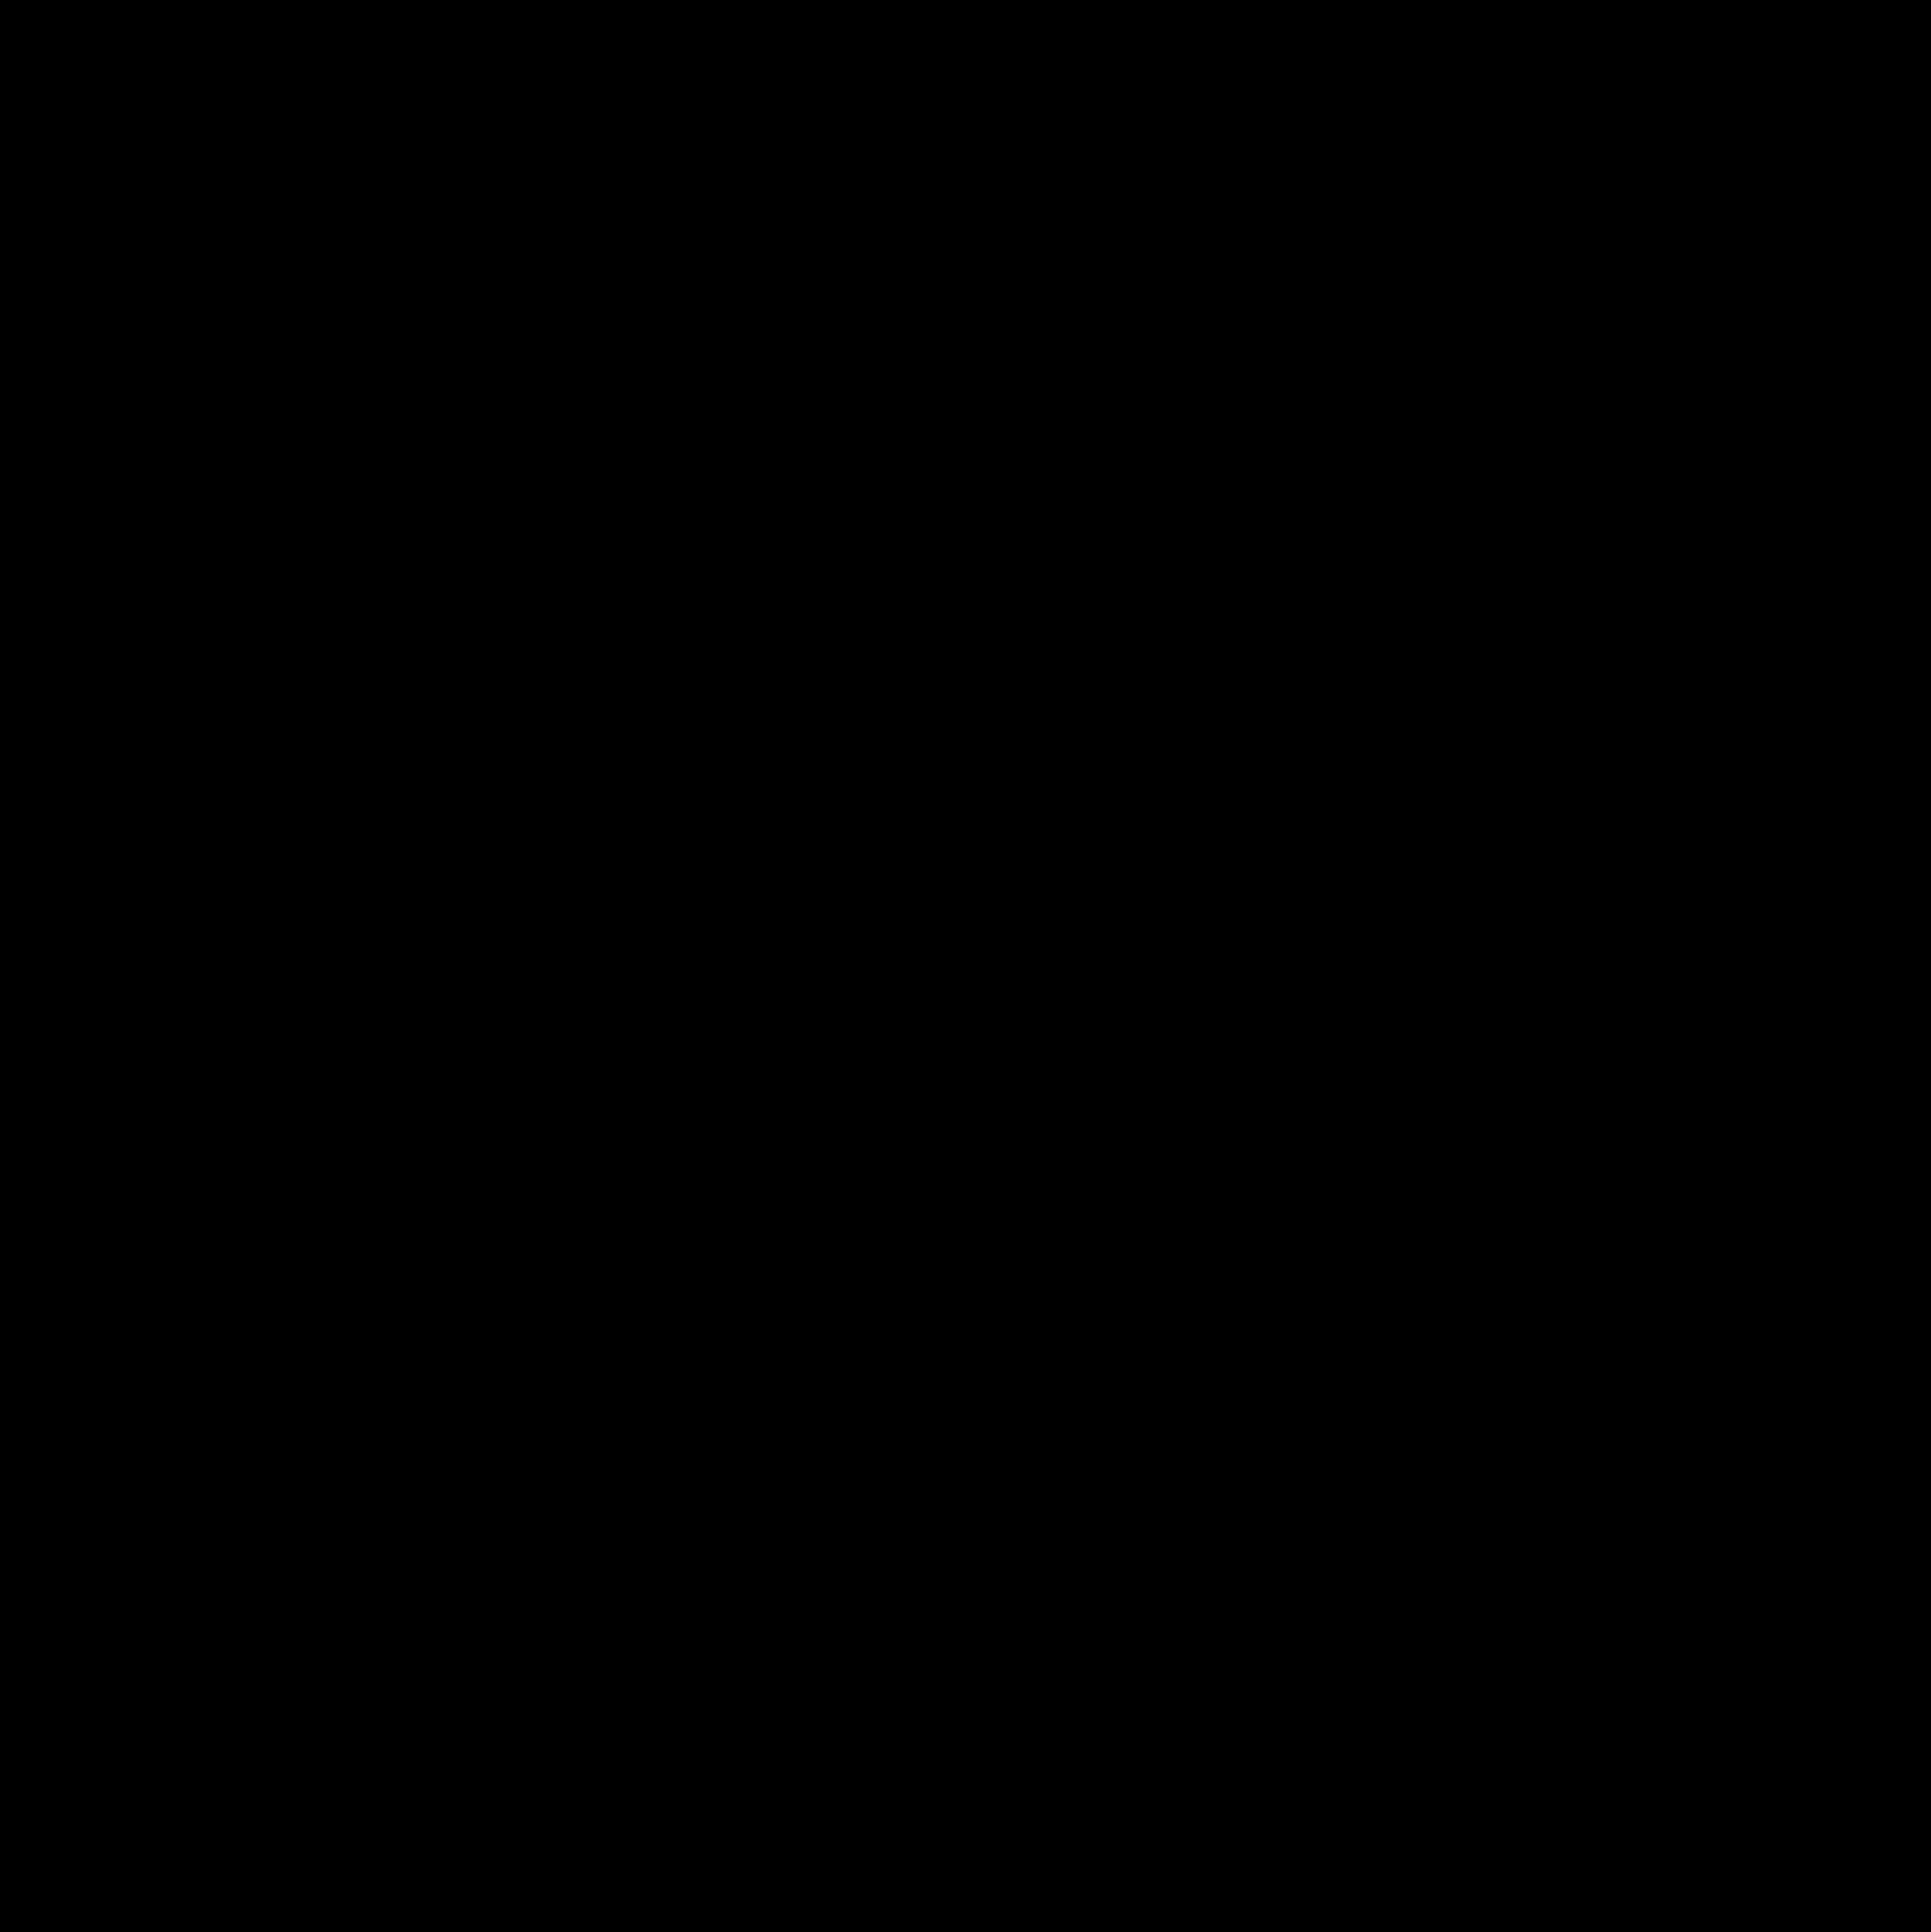 Corner clipart geometric. Pattern big image png